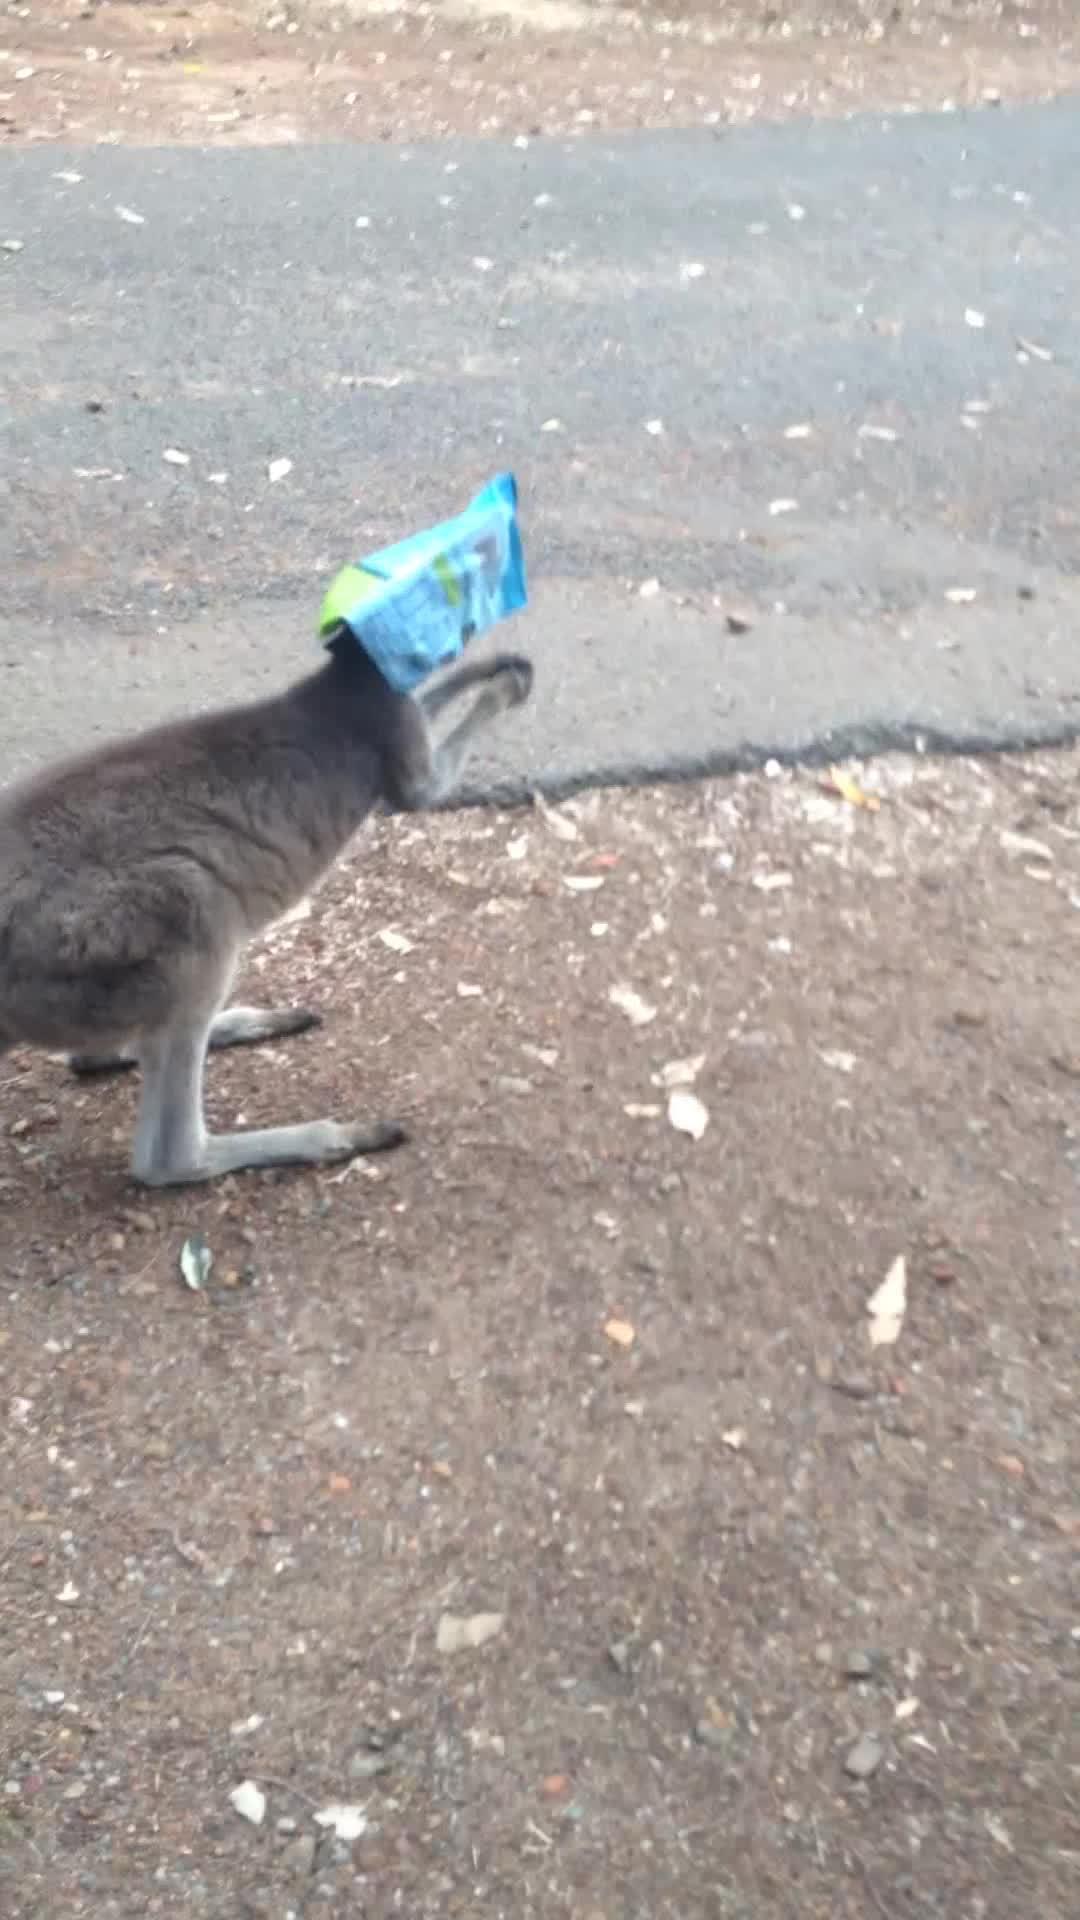 AnimalsBeingConfused, AskReddit, kangaroo head buts car, Kangaroo gets head stuck in chips and head buts car GIFs